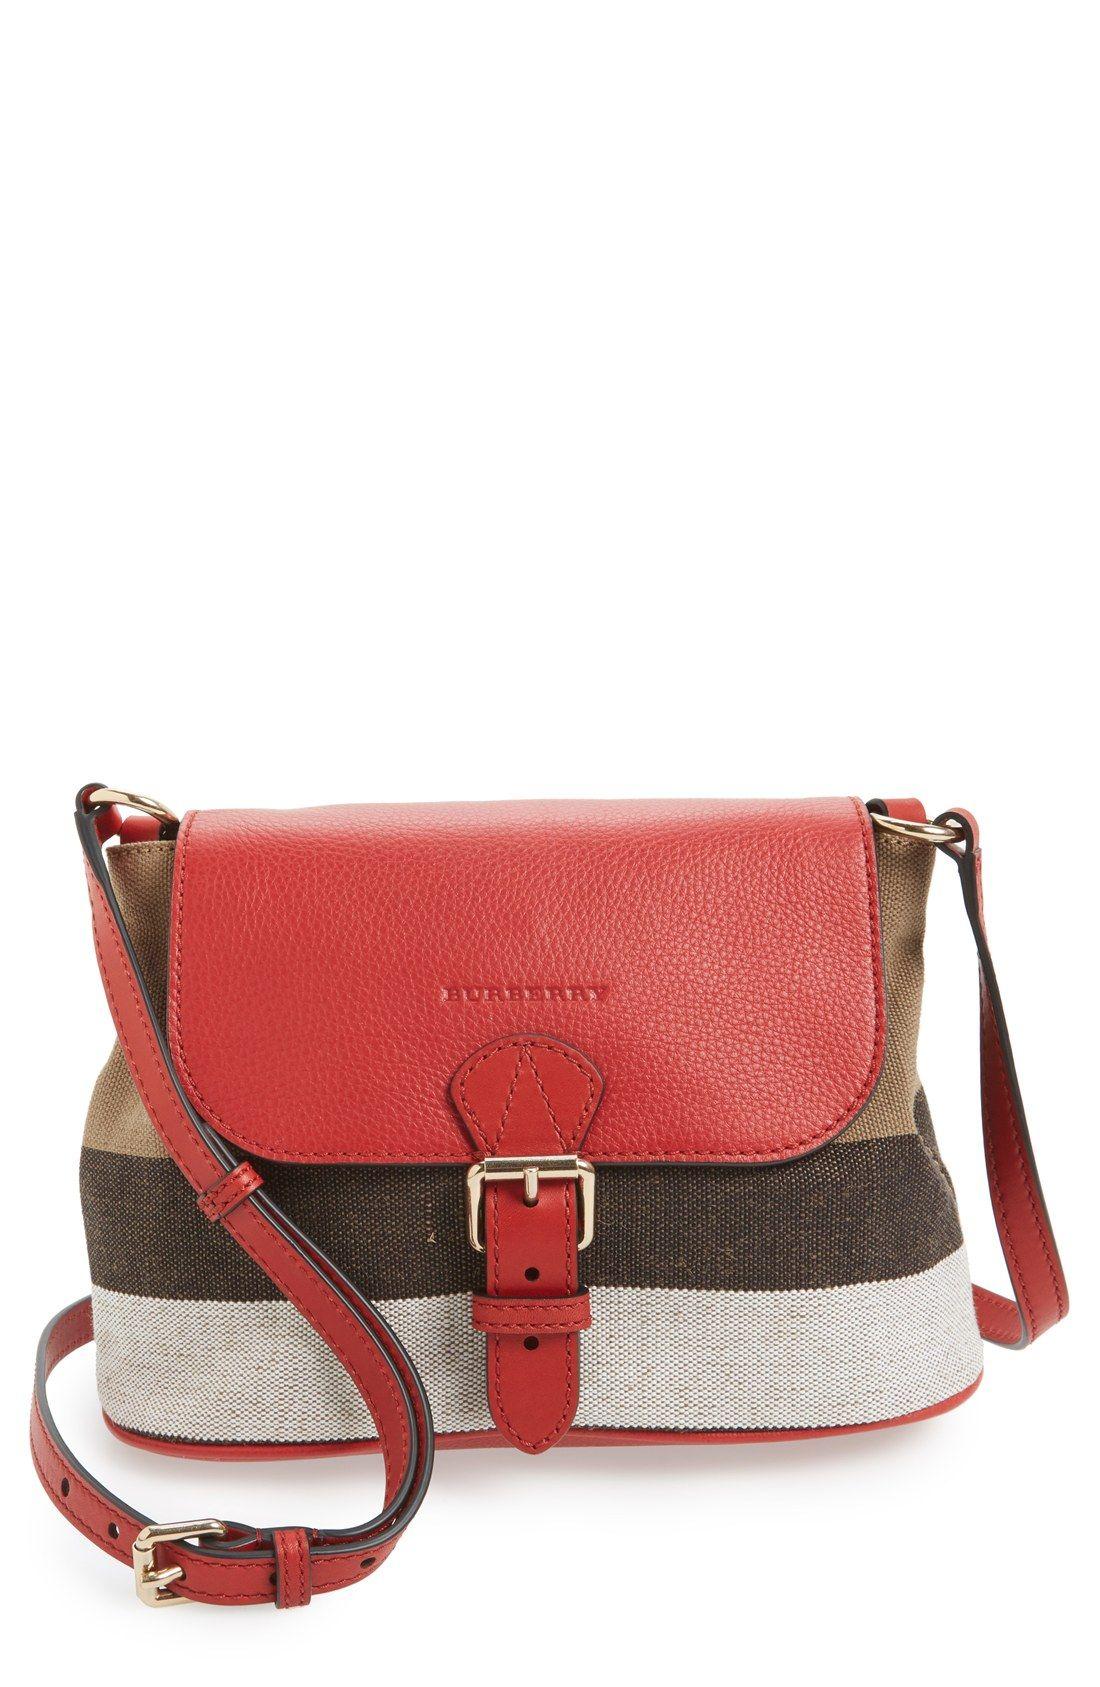 c8b03d06ea95 Burberry  Small Gowan  Crossbody Bag